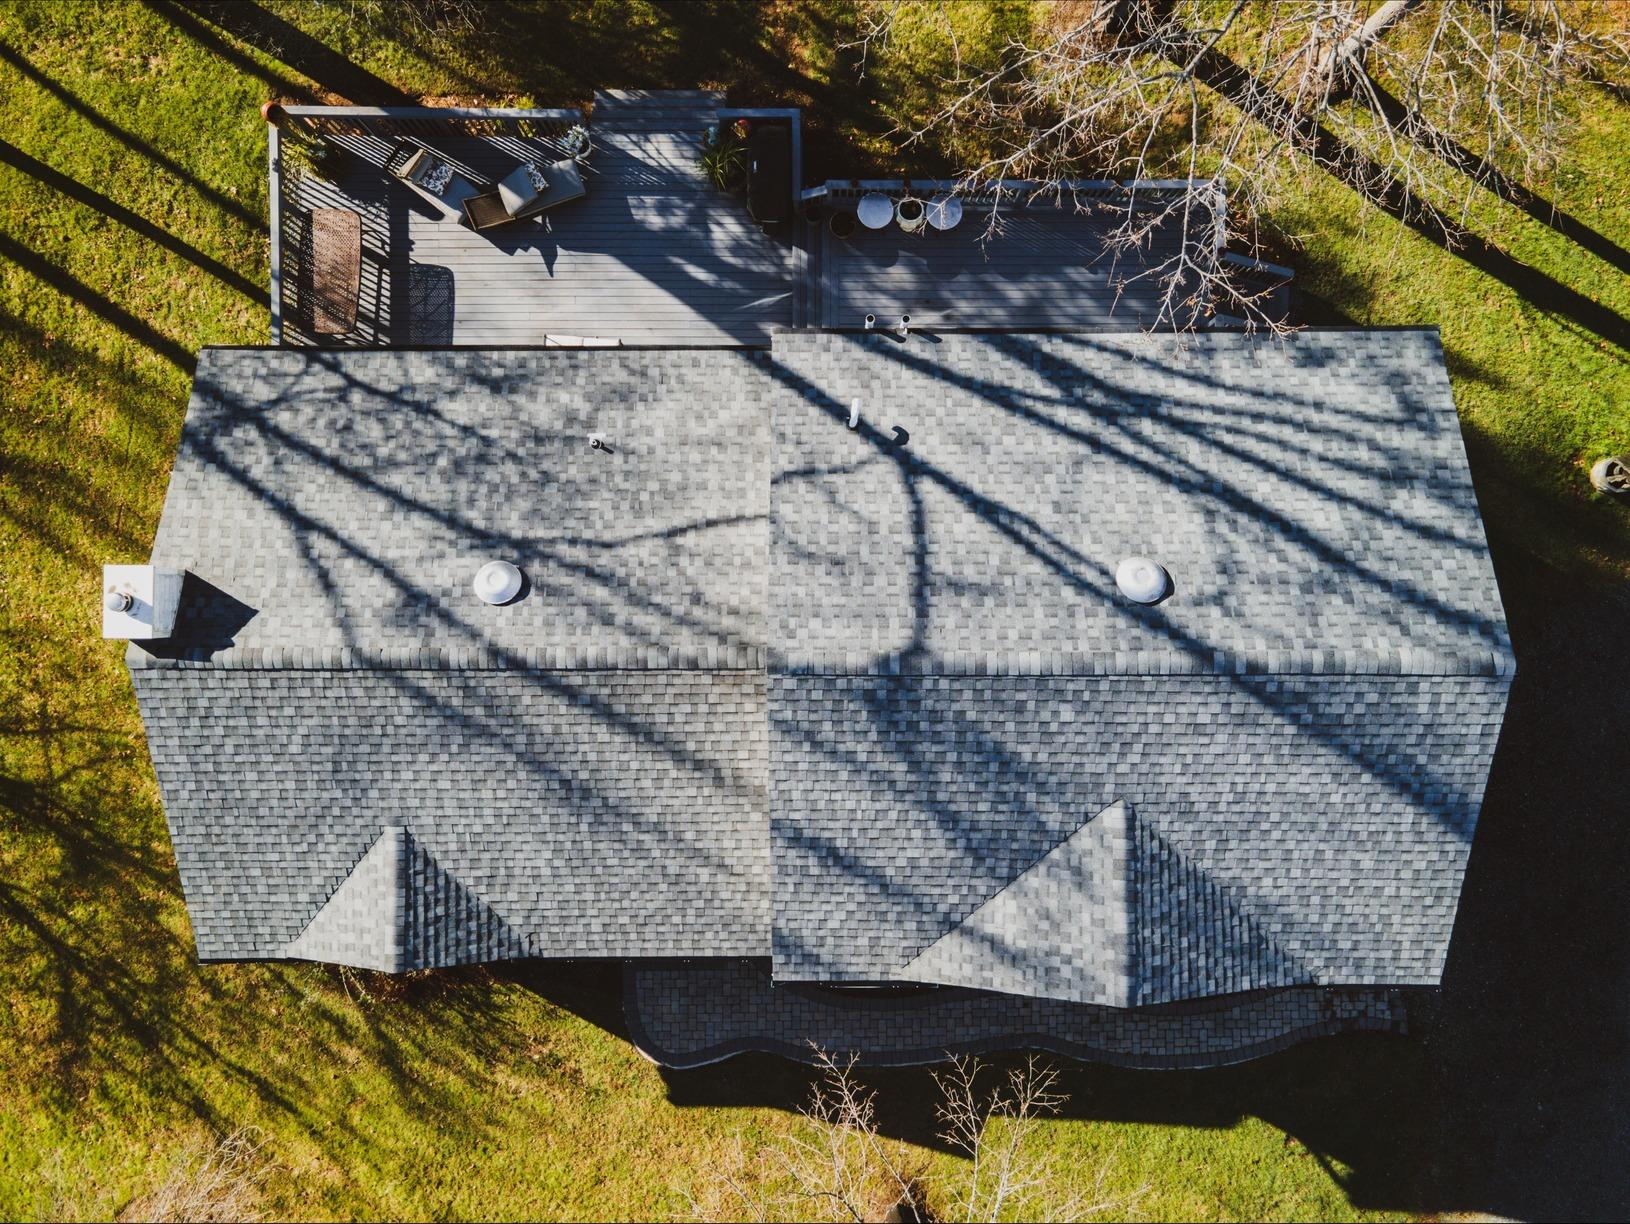 Roof Repair in Flemington, NJ - After Photo